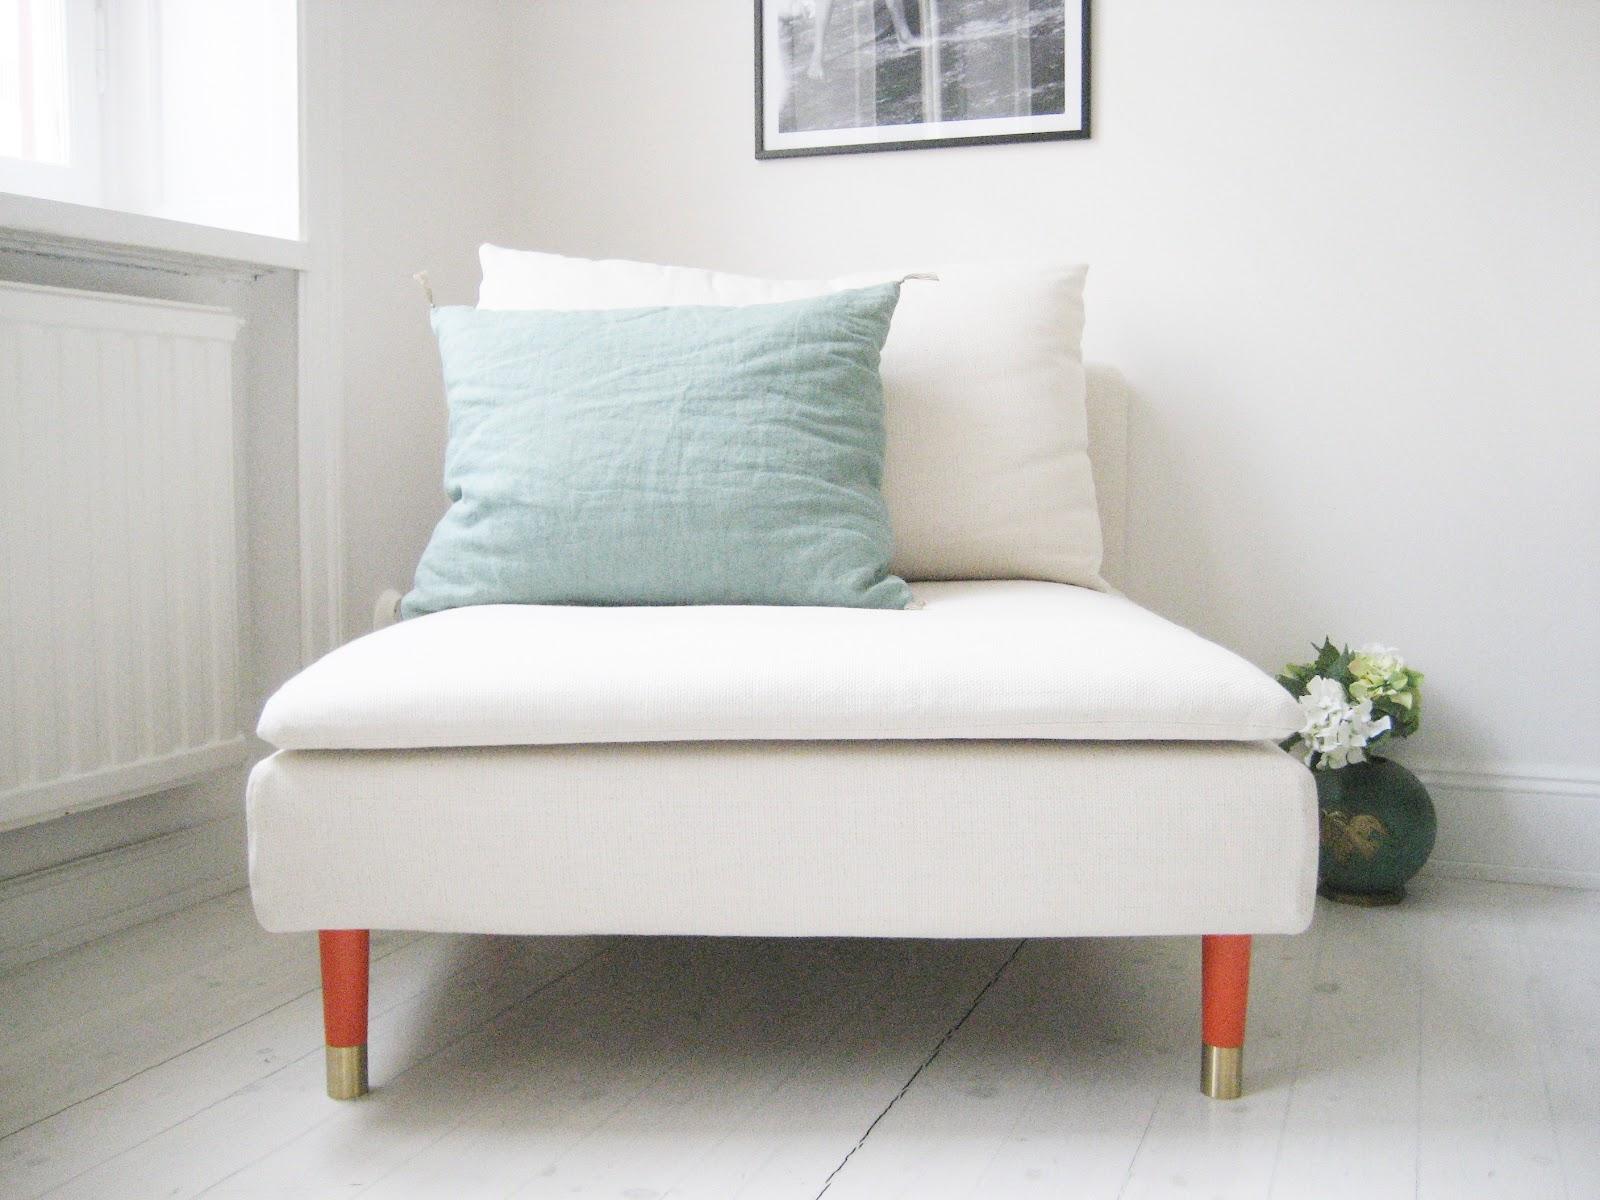 Personaliza Tus Muebles De Ikea  # Muebles Westing